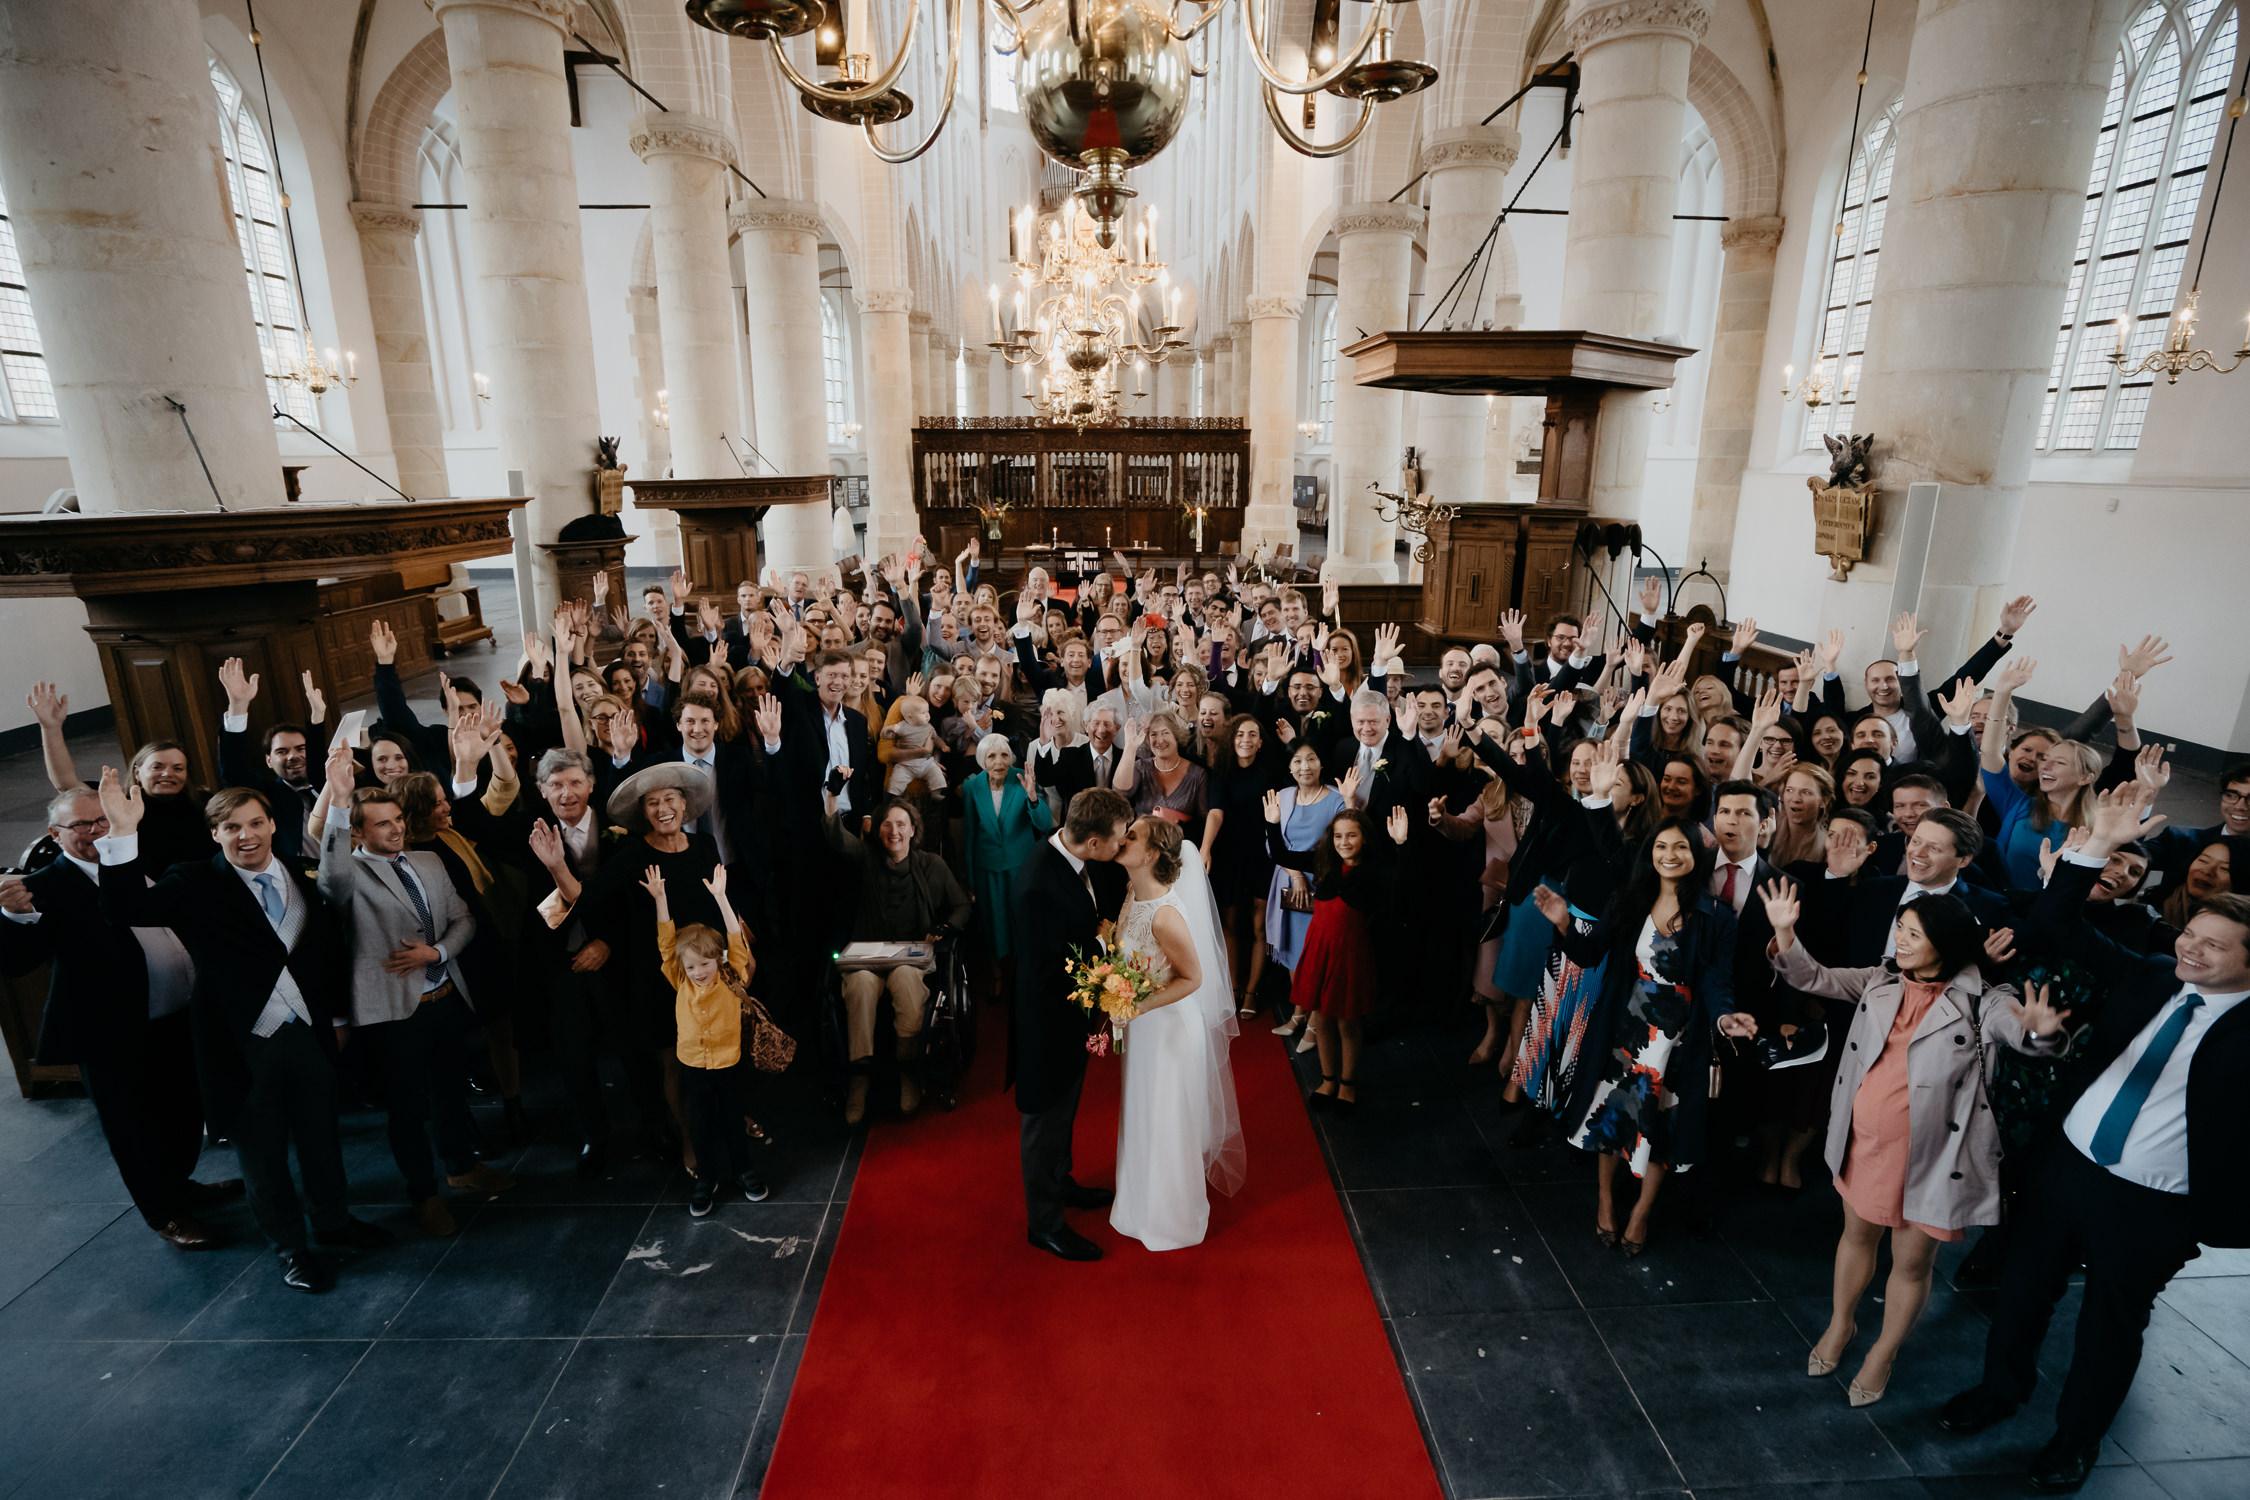 bruiloft foto raportage kerk amsterdam fotografie